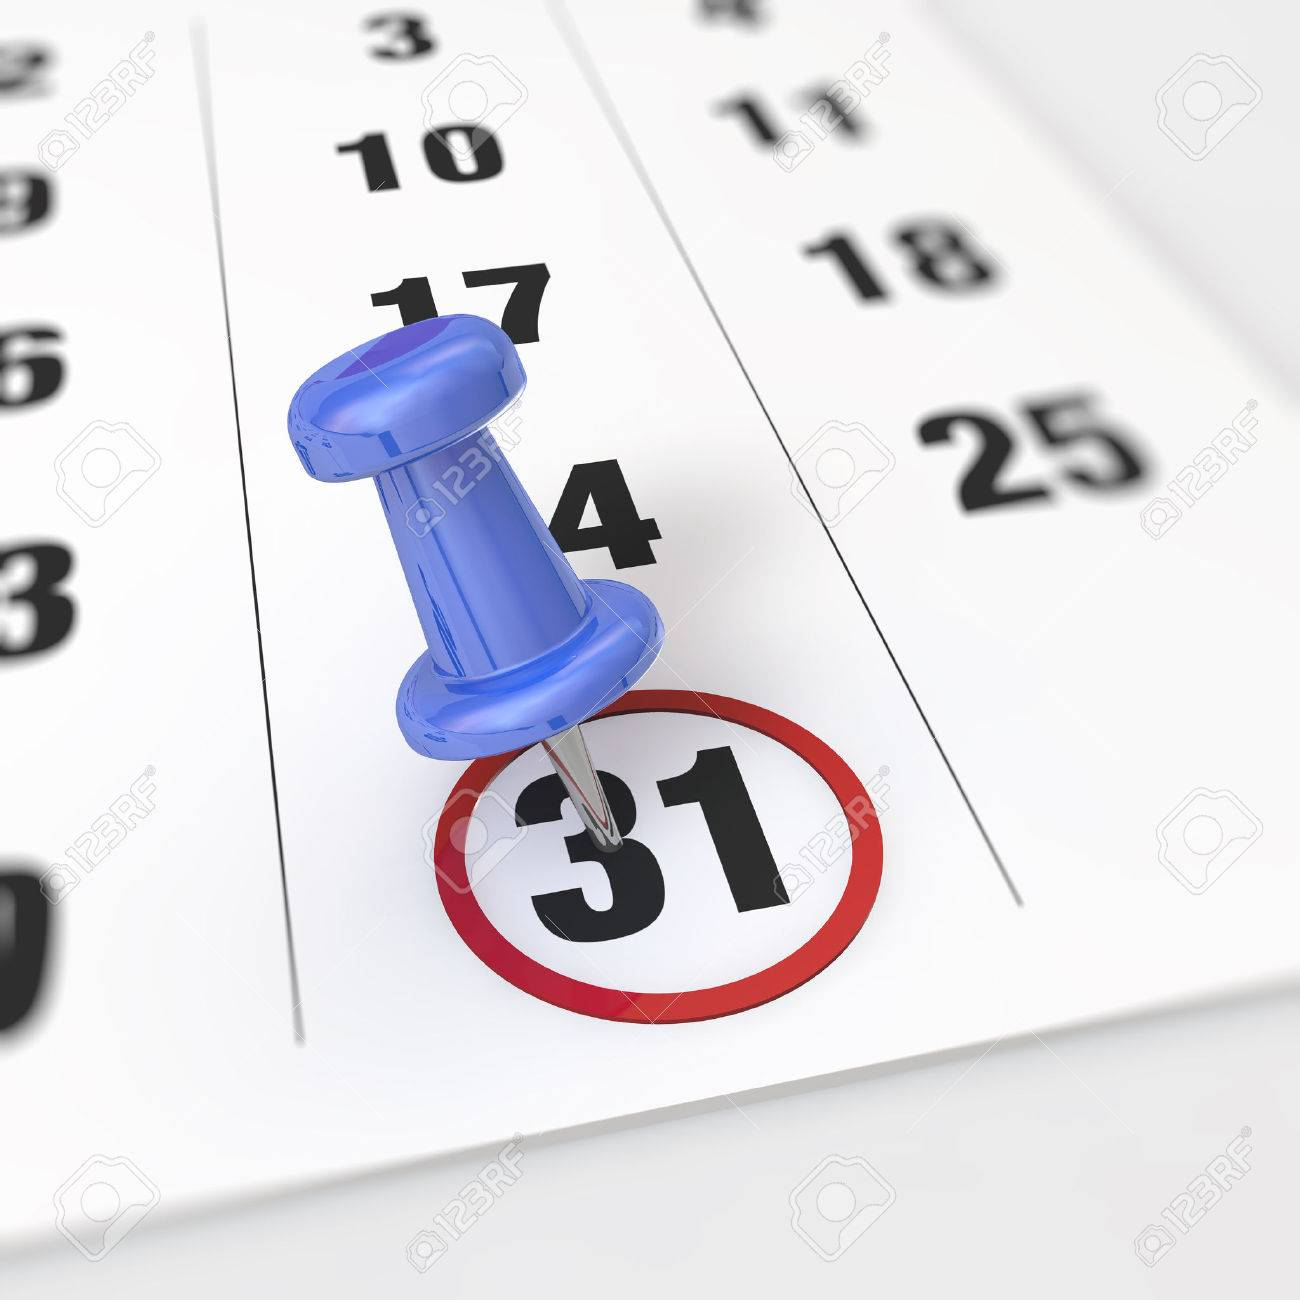 Calendar and blue pushpin. Mark on the calendar at 31. - 31281622